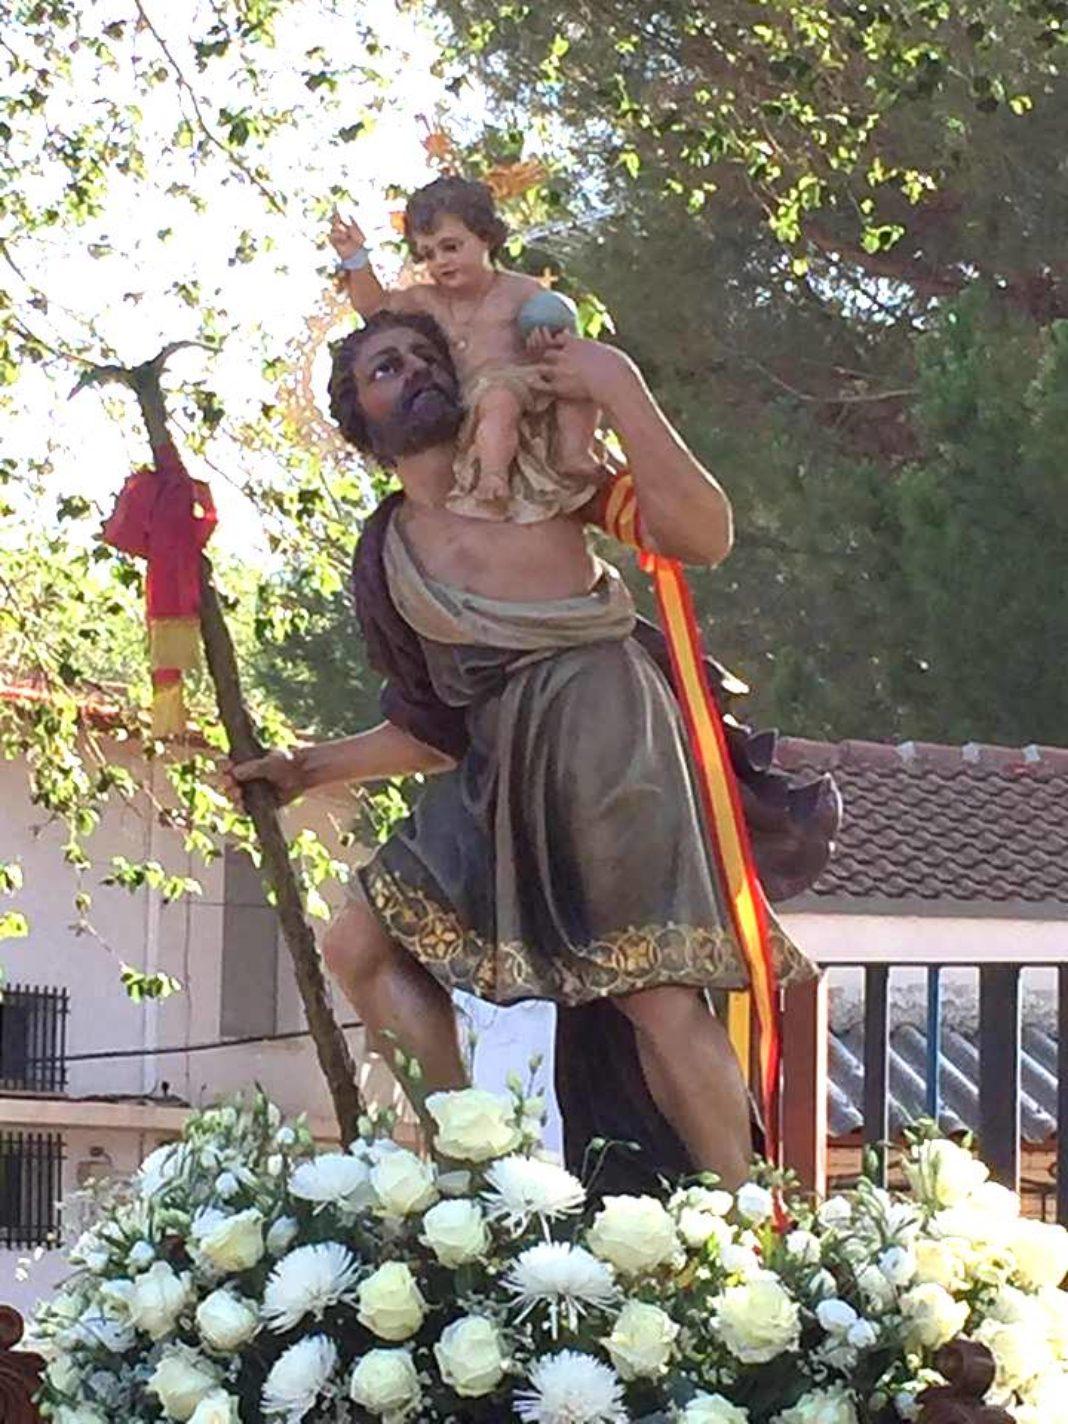 Imagen de San Cristóbal de Herencia 1068x1424 - Programa de actos religiosos y festivos en honor a San Cristóbal